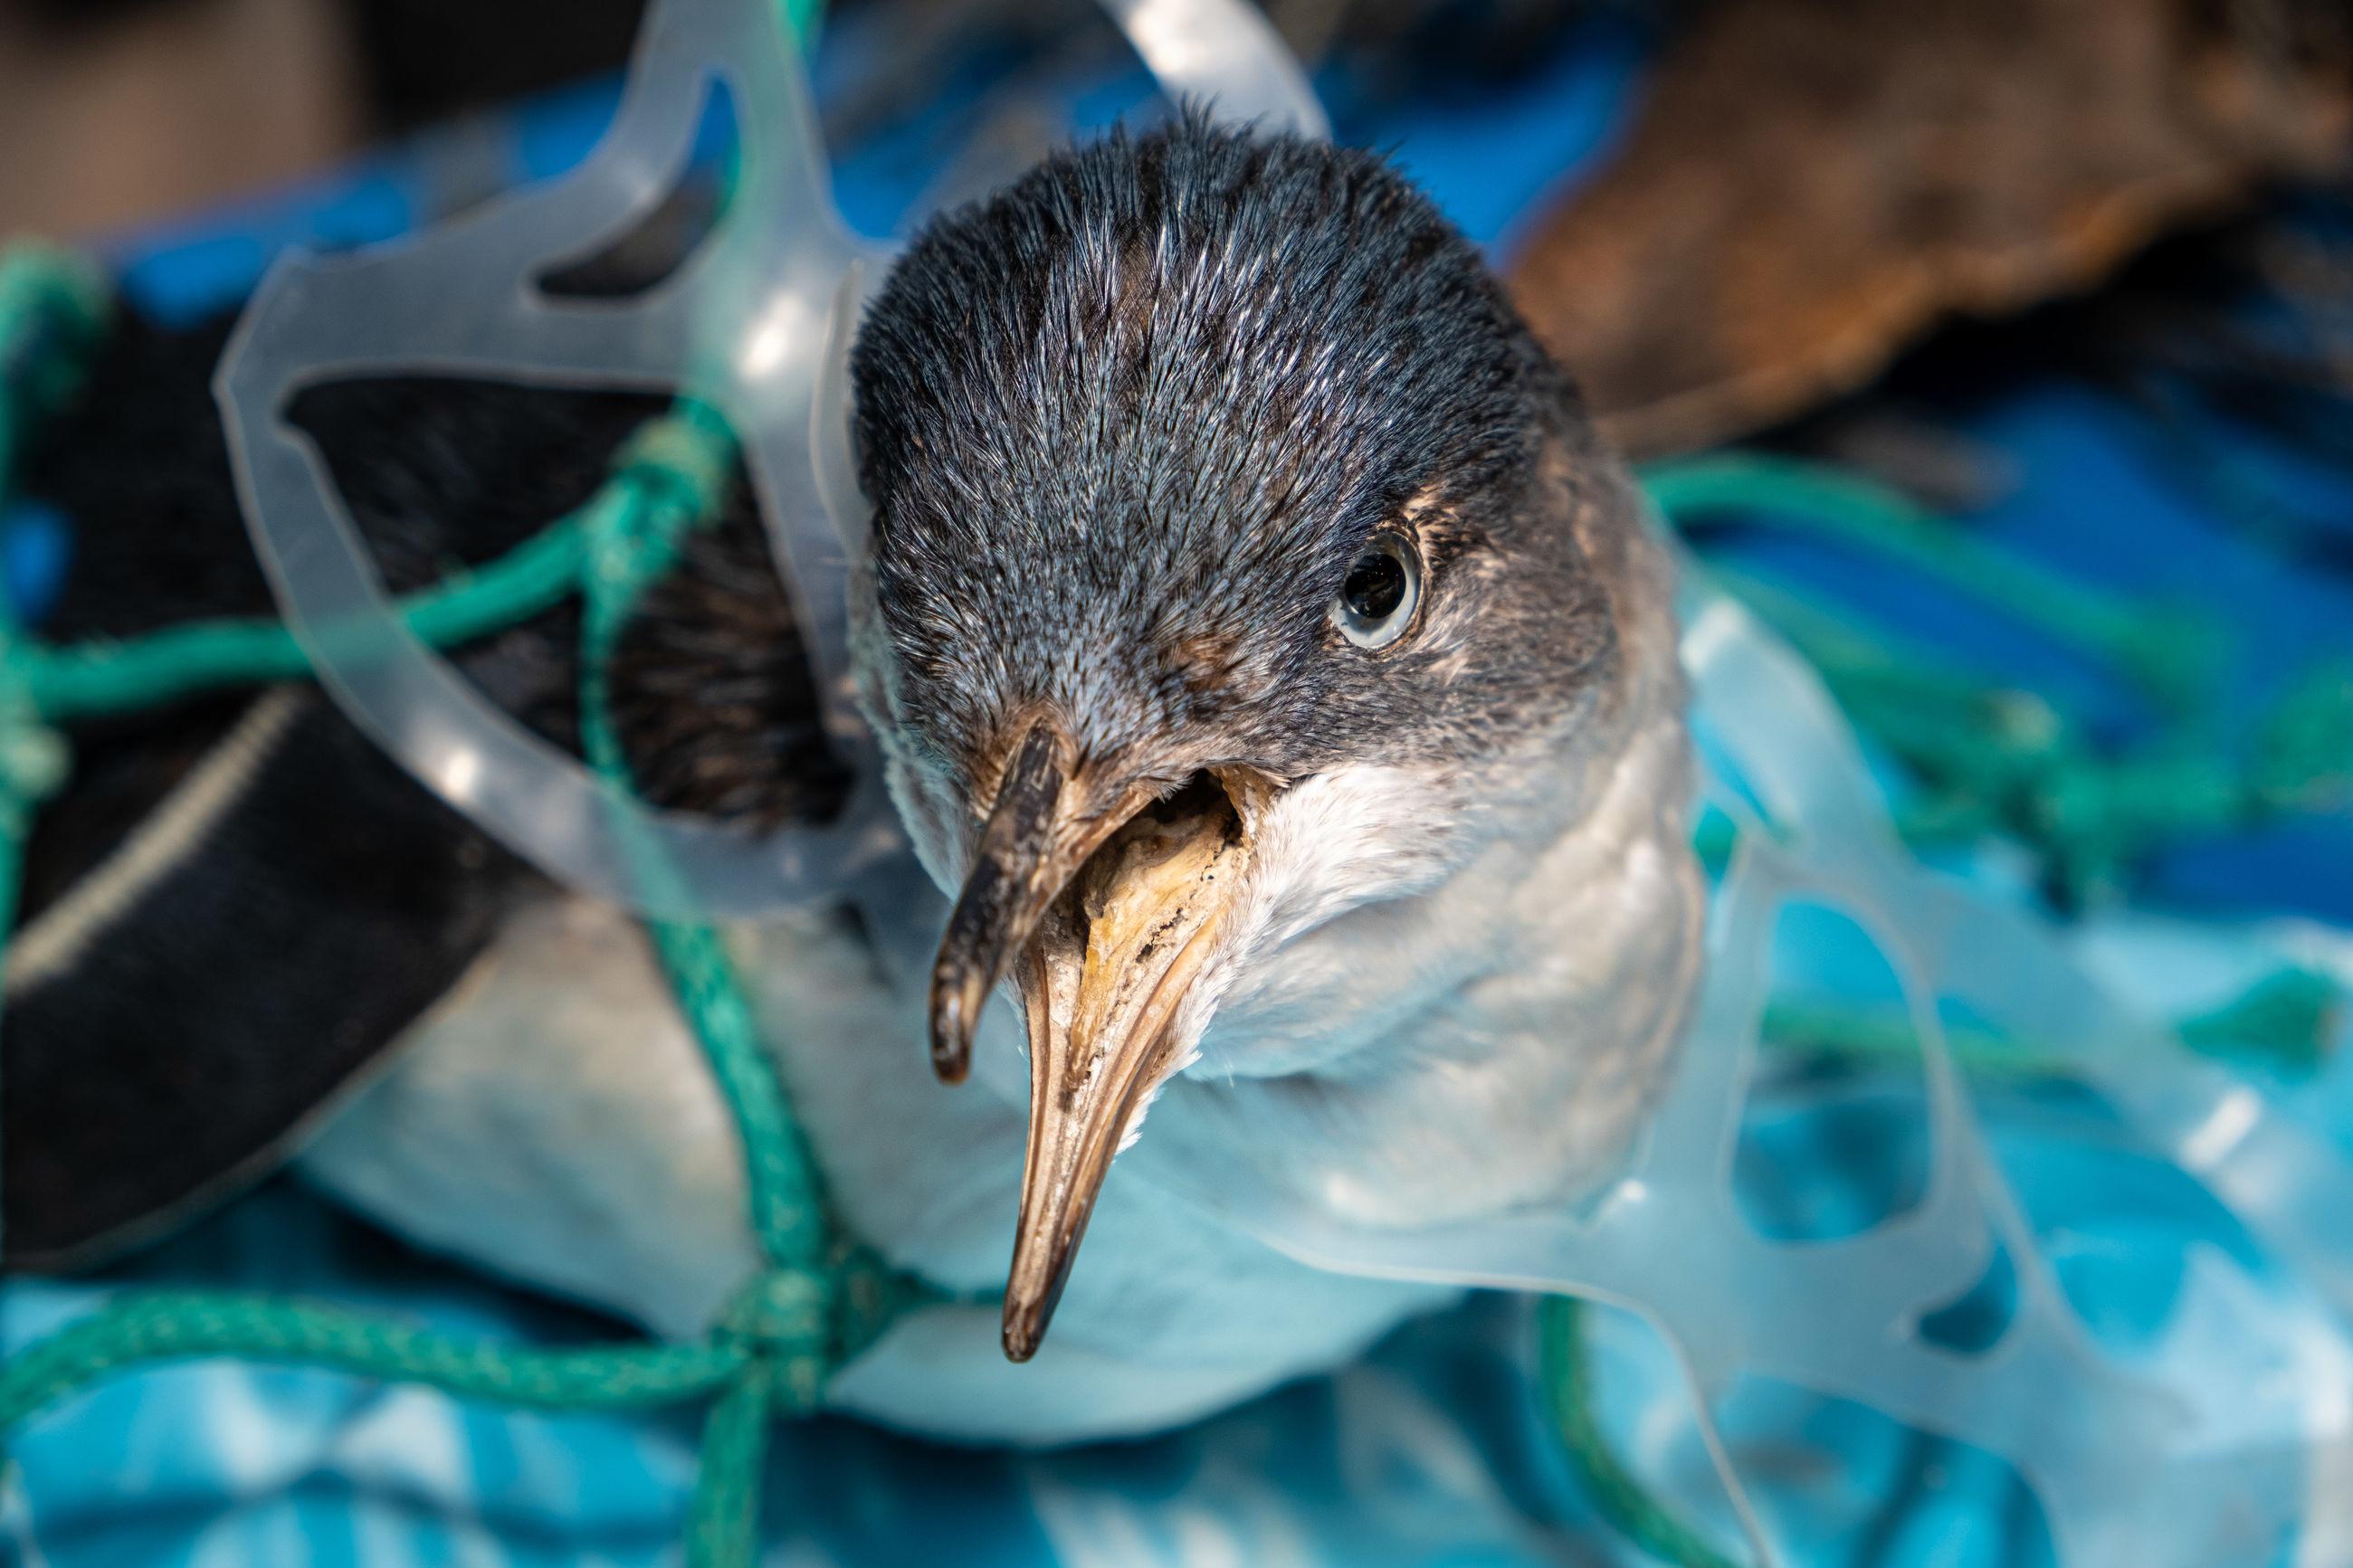 Close-up of bird in plastic garbage